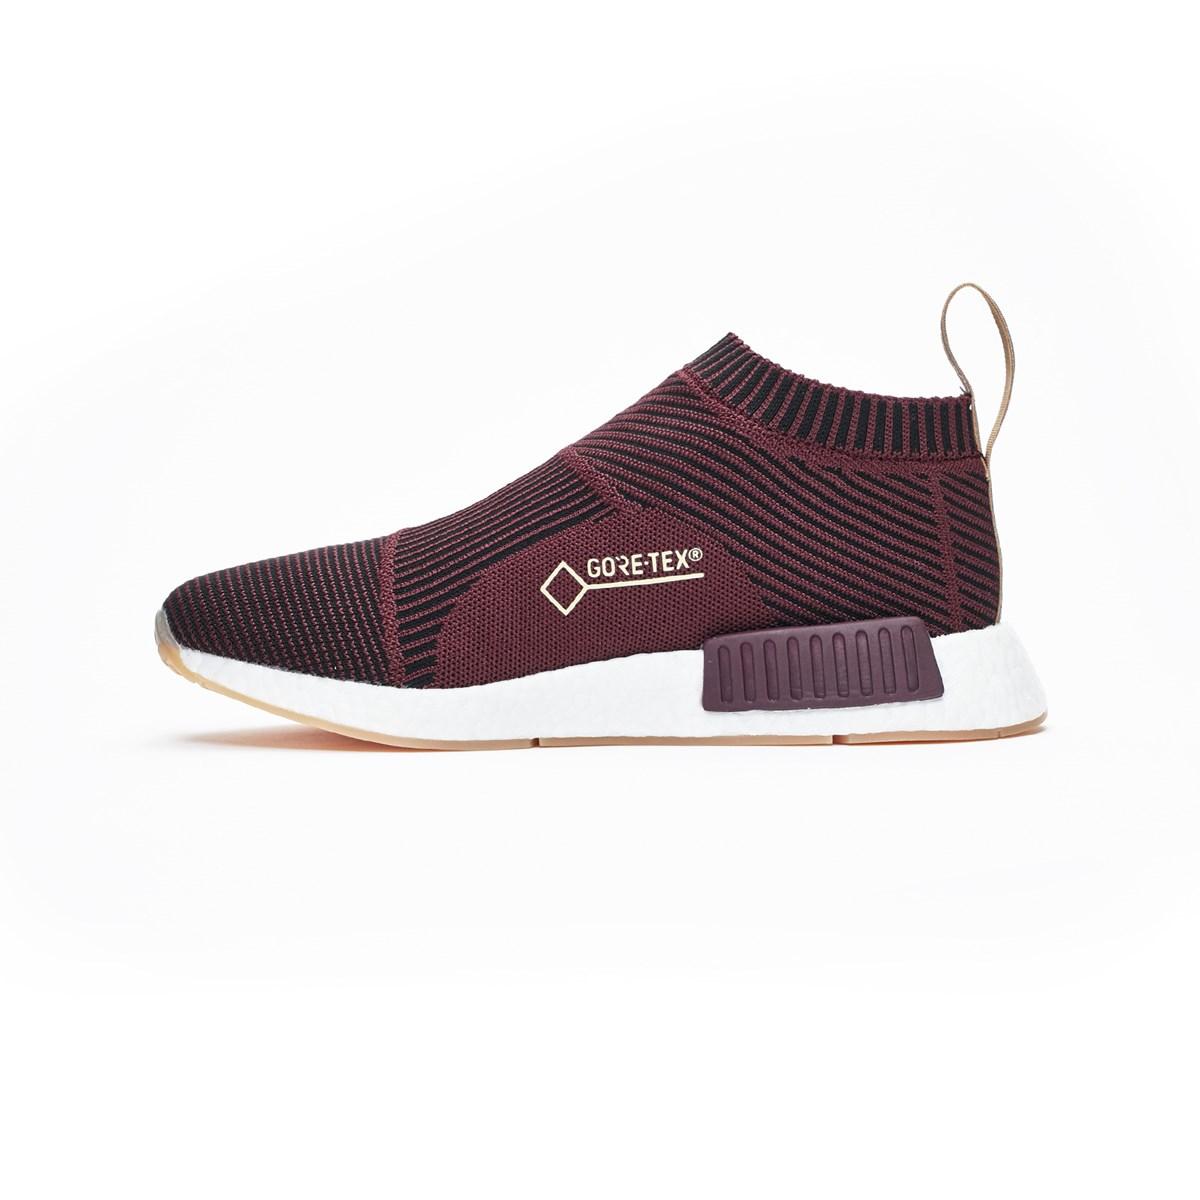 0000624420931 adidas NMD CS1 GORE-TEX Primeknit SNS Exclusive - Aq0364 - Sneakersnstuff